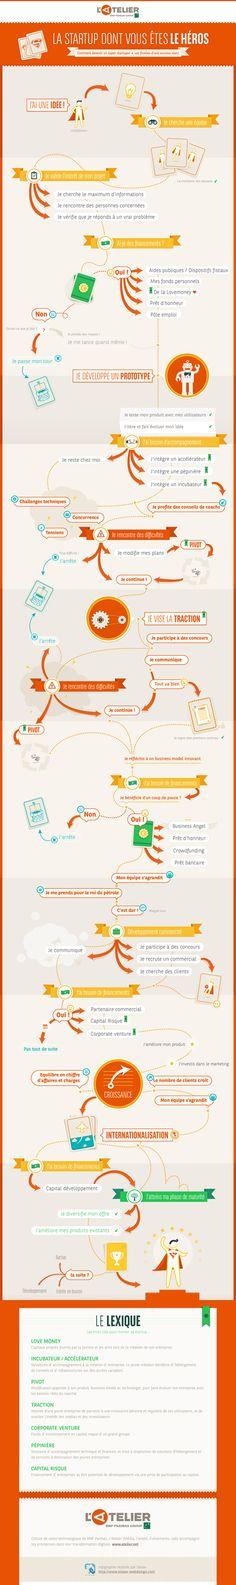 How to launch a startup? - How to launch a startup? - How to launch a startup? – How to launch a startup? Start Up Business, Business Planning, Marketing Data, Digital Marketing, Social Entrepreneurship, Start Ups, Social Enterprise, Instagram And Snapchat, Cool Things To Make